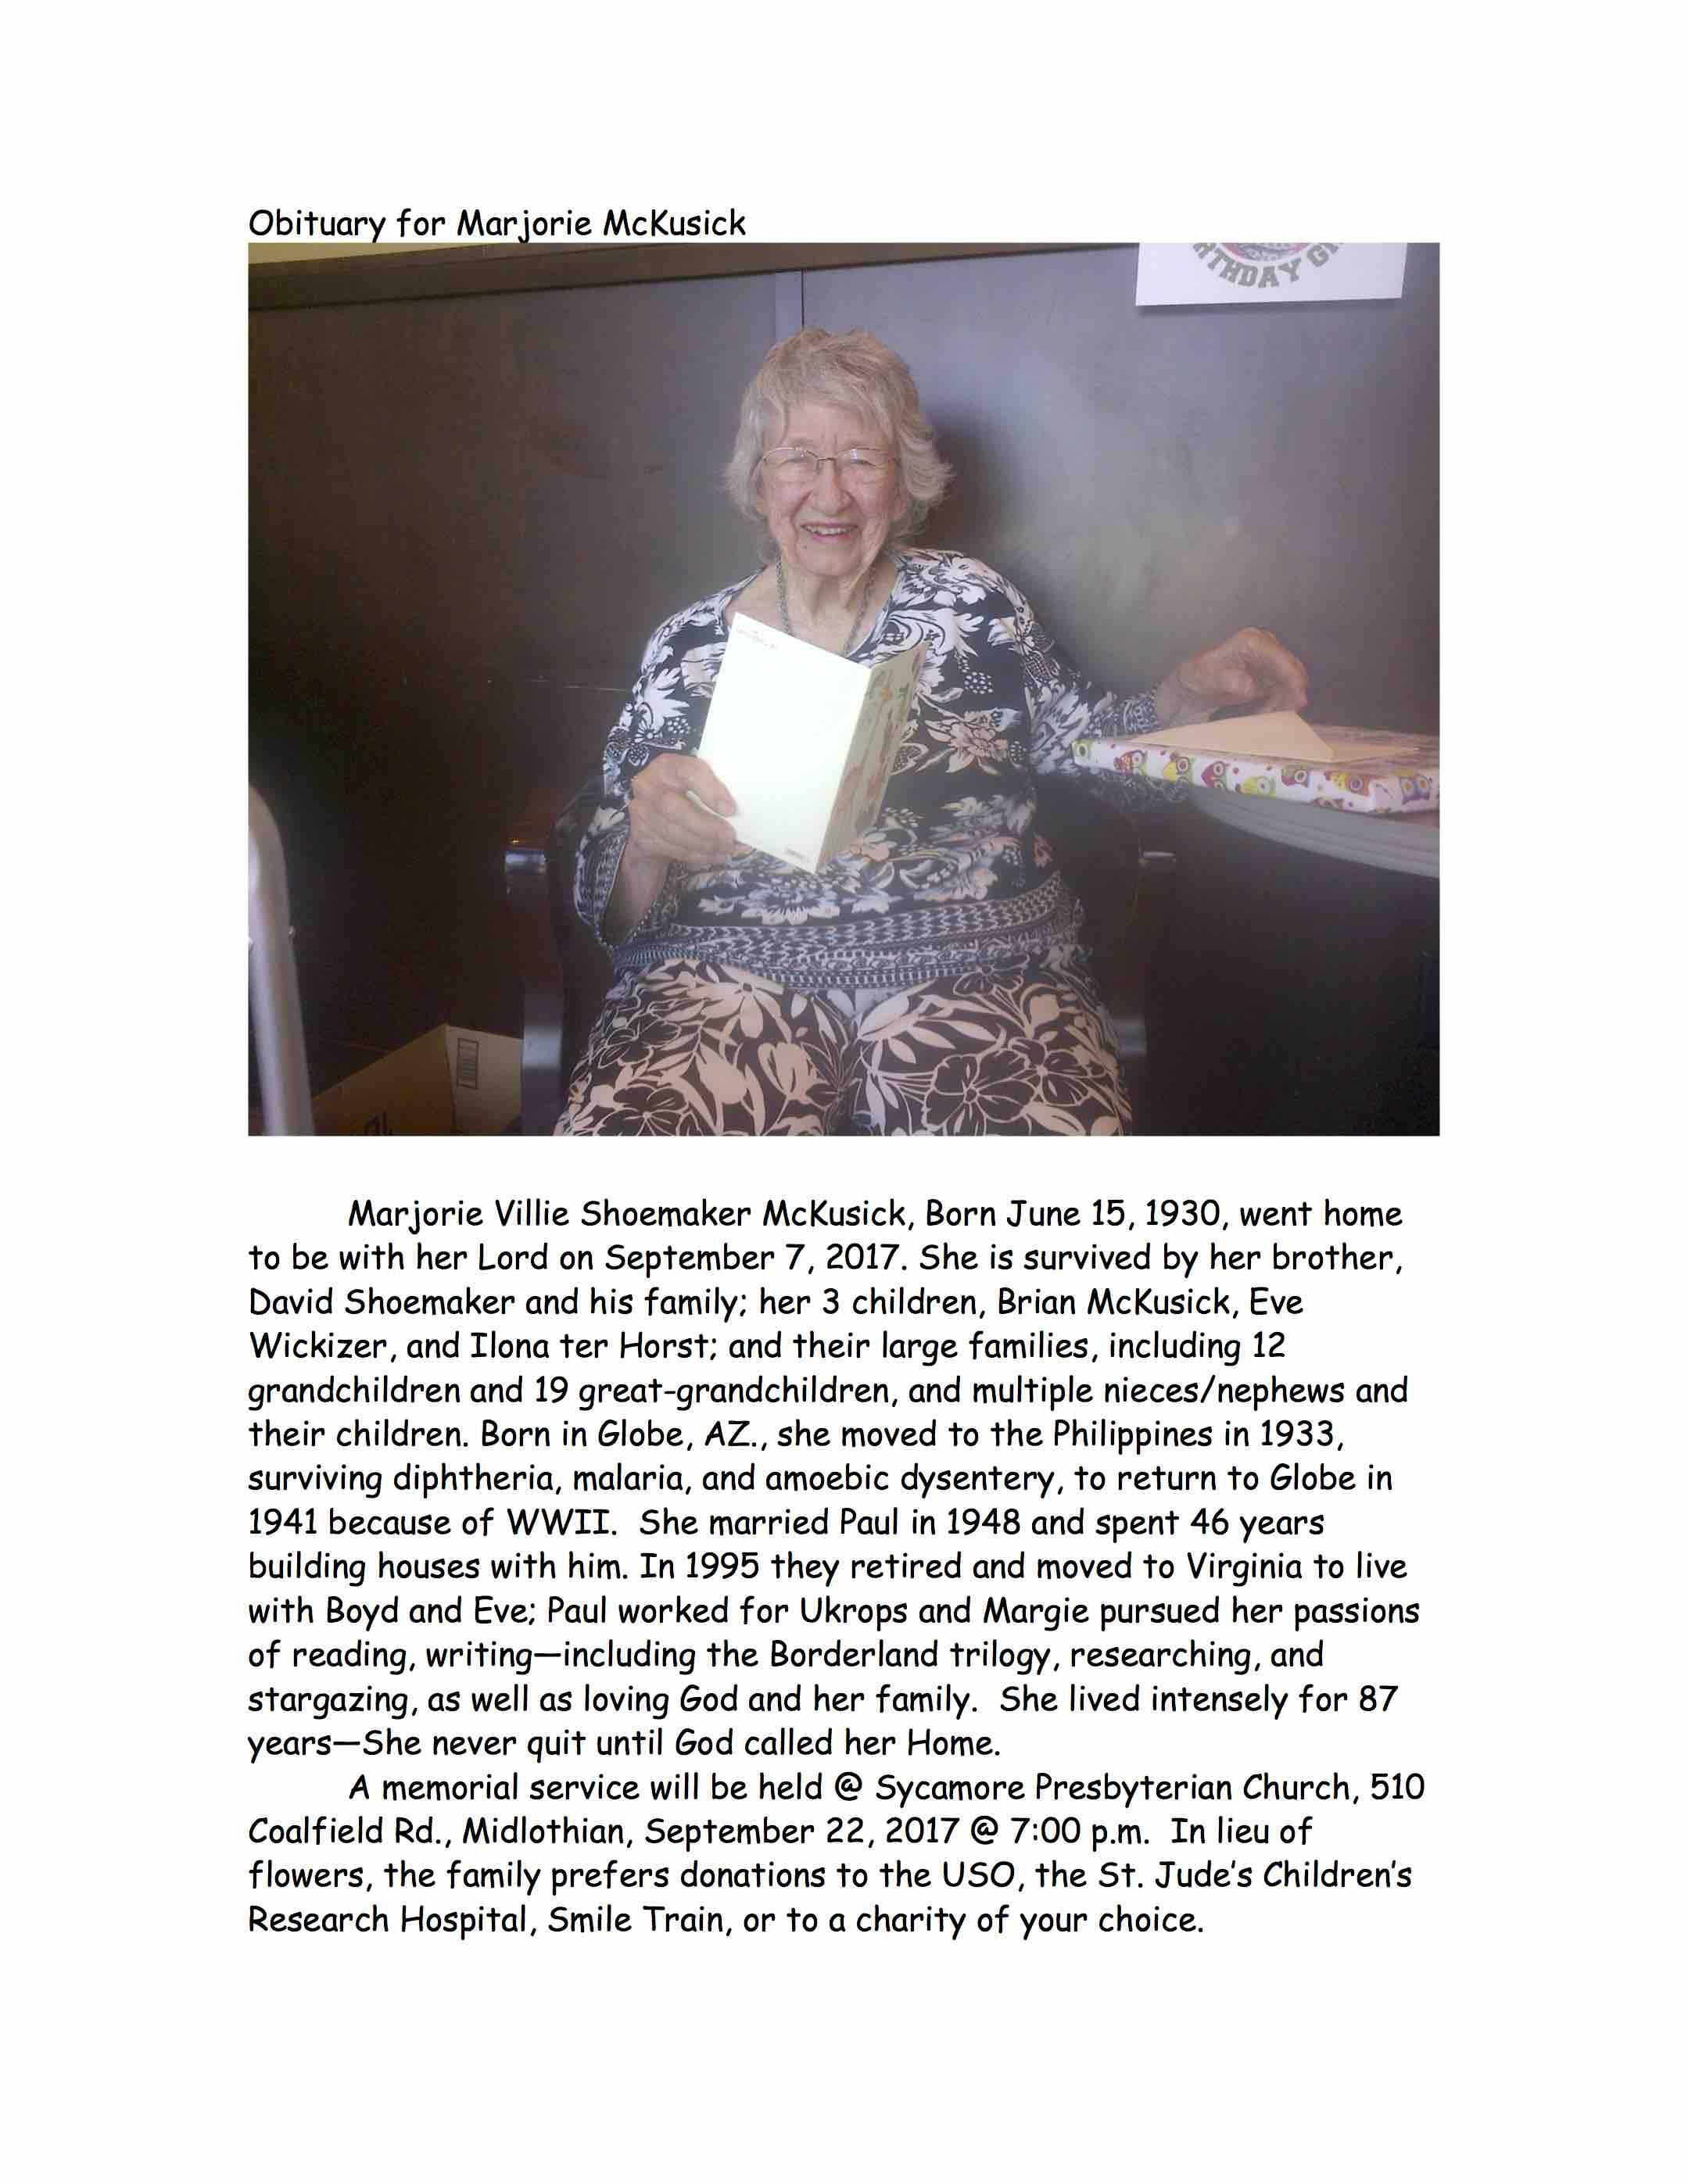 Obituary for Marjorie McKusick.jpg